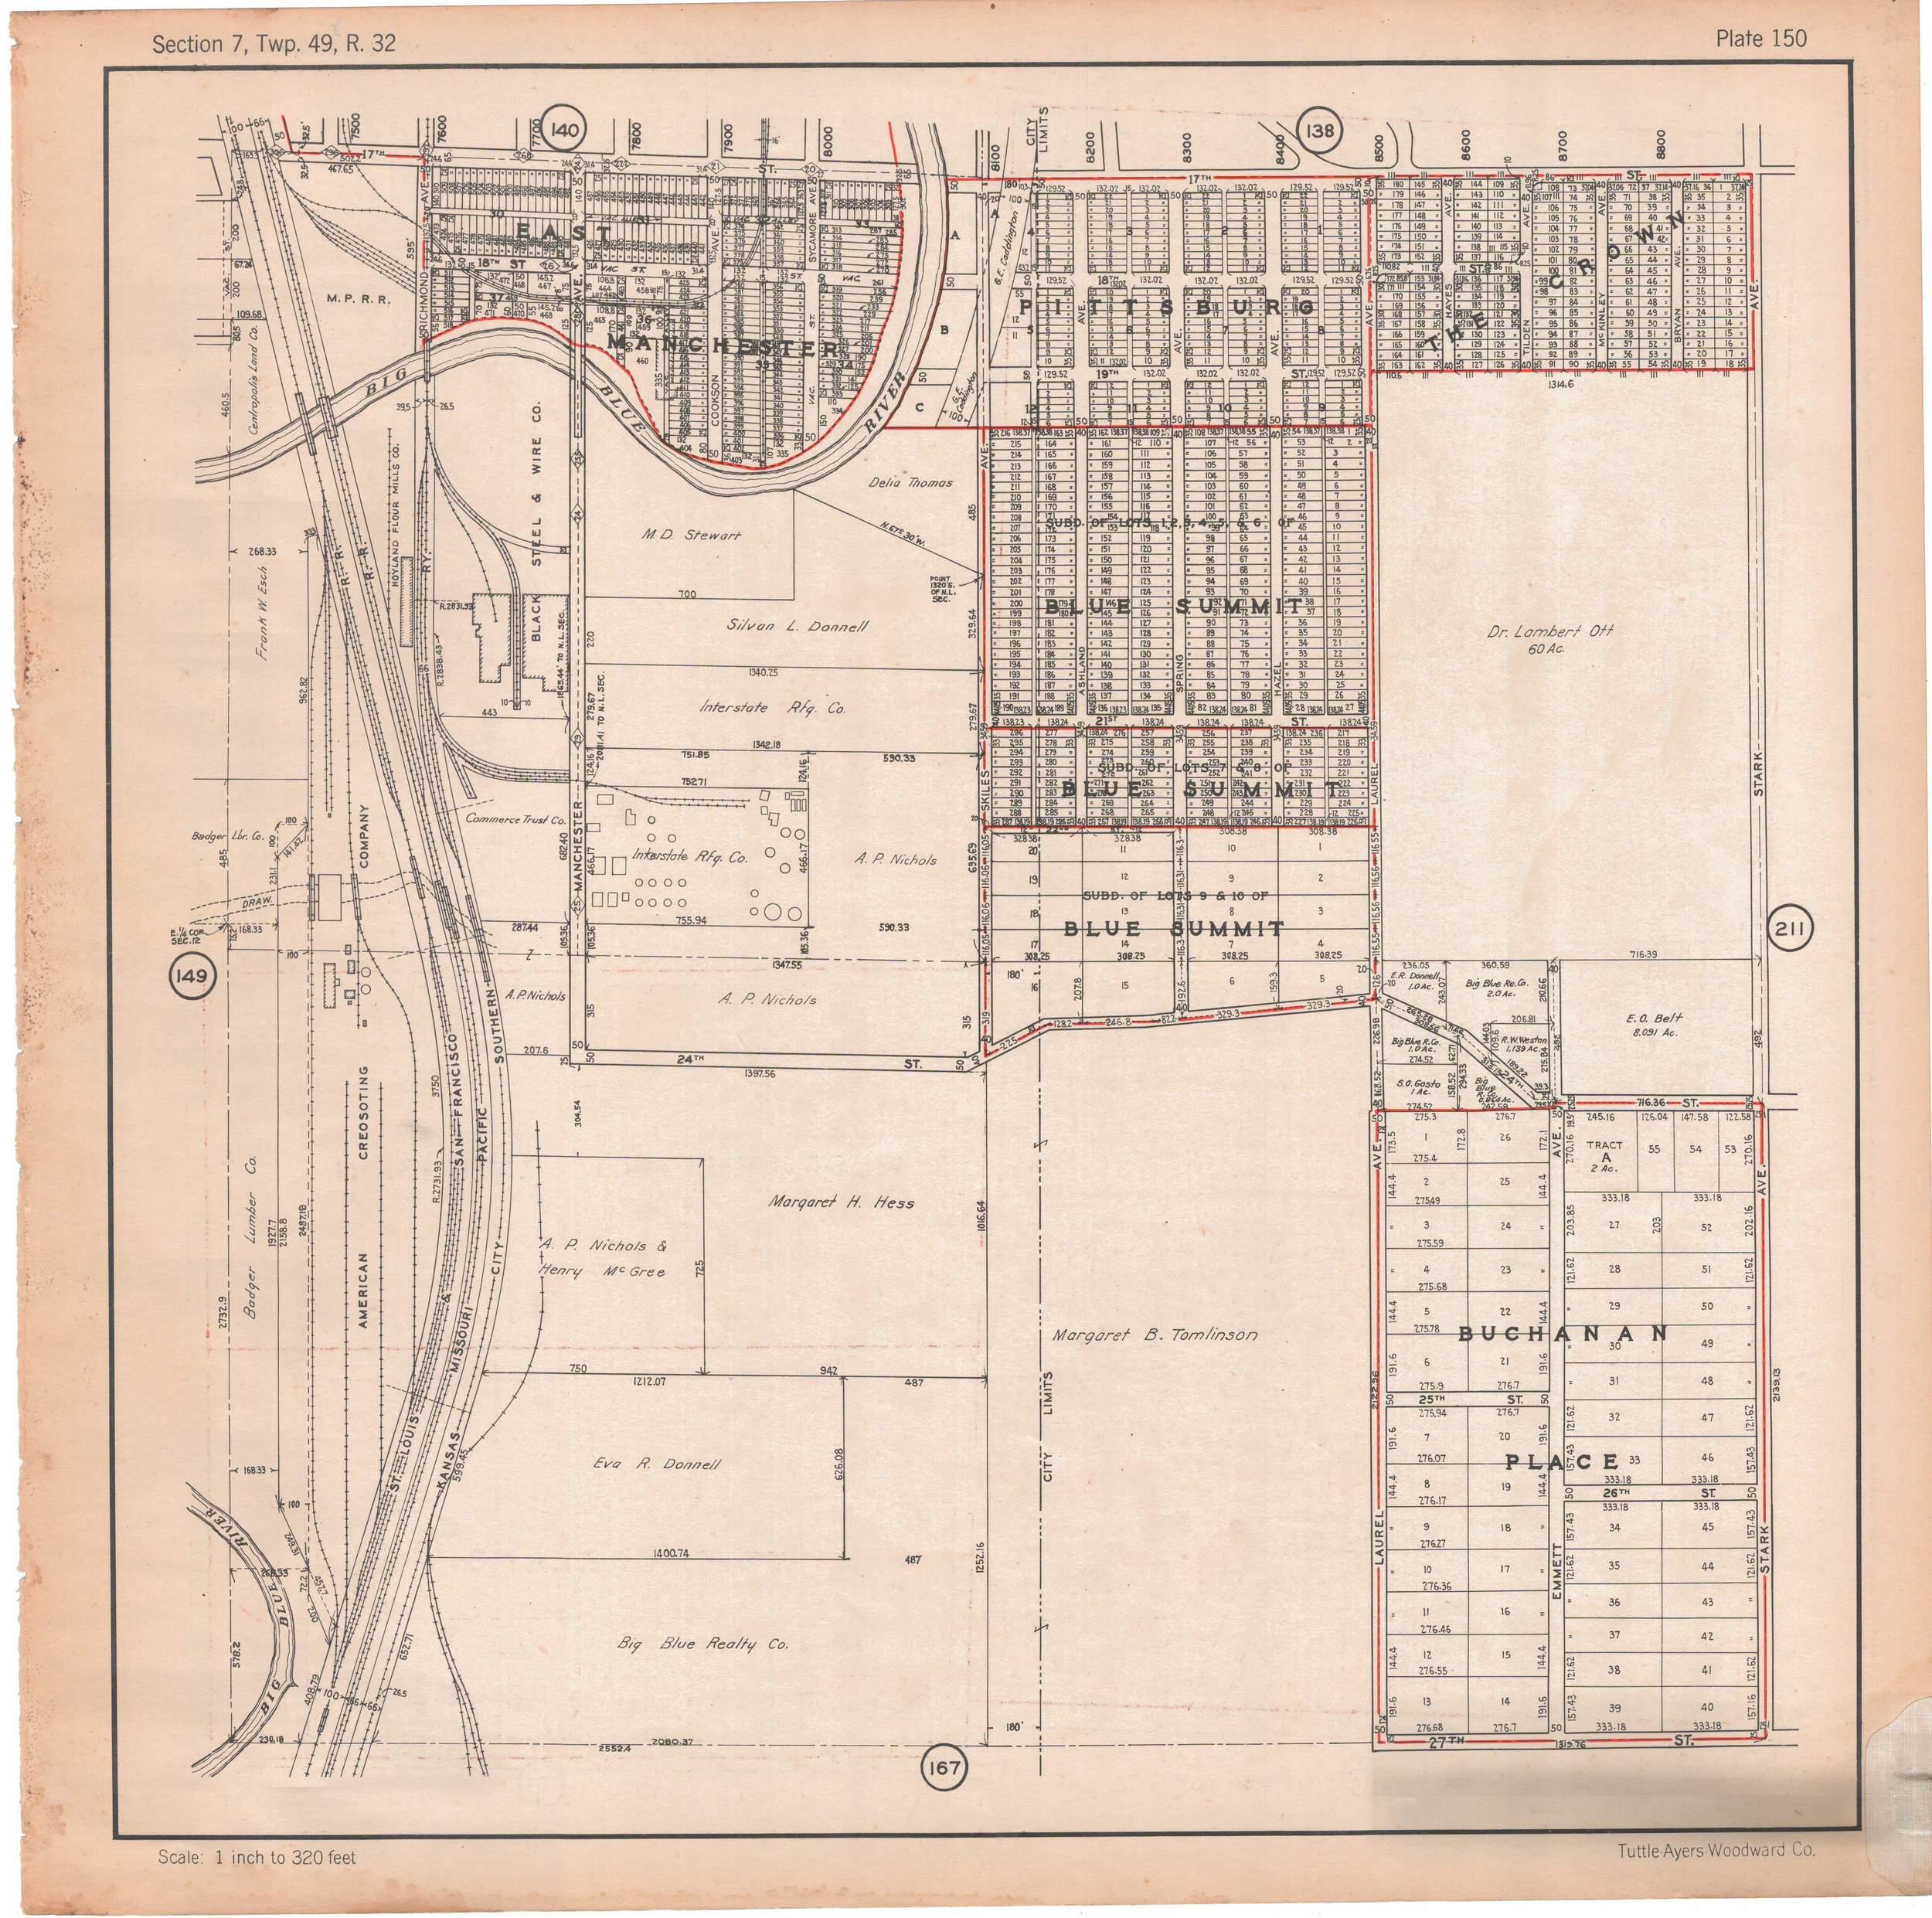 1925 TUTTLE_AYERS_Plate_150.JPG